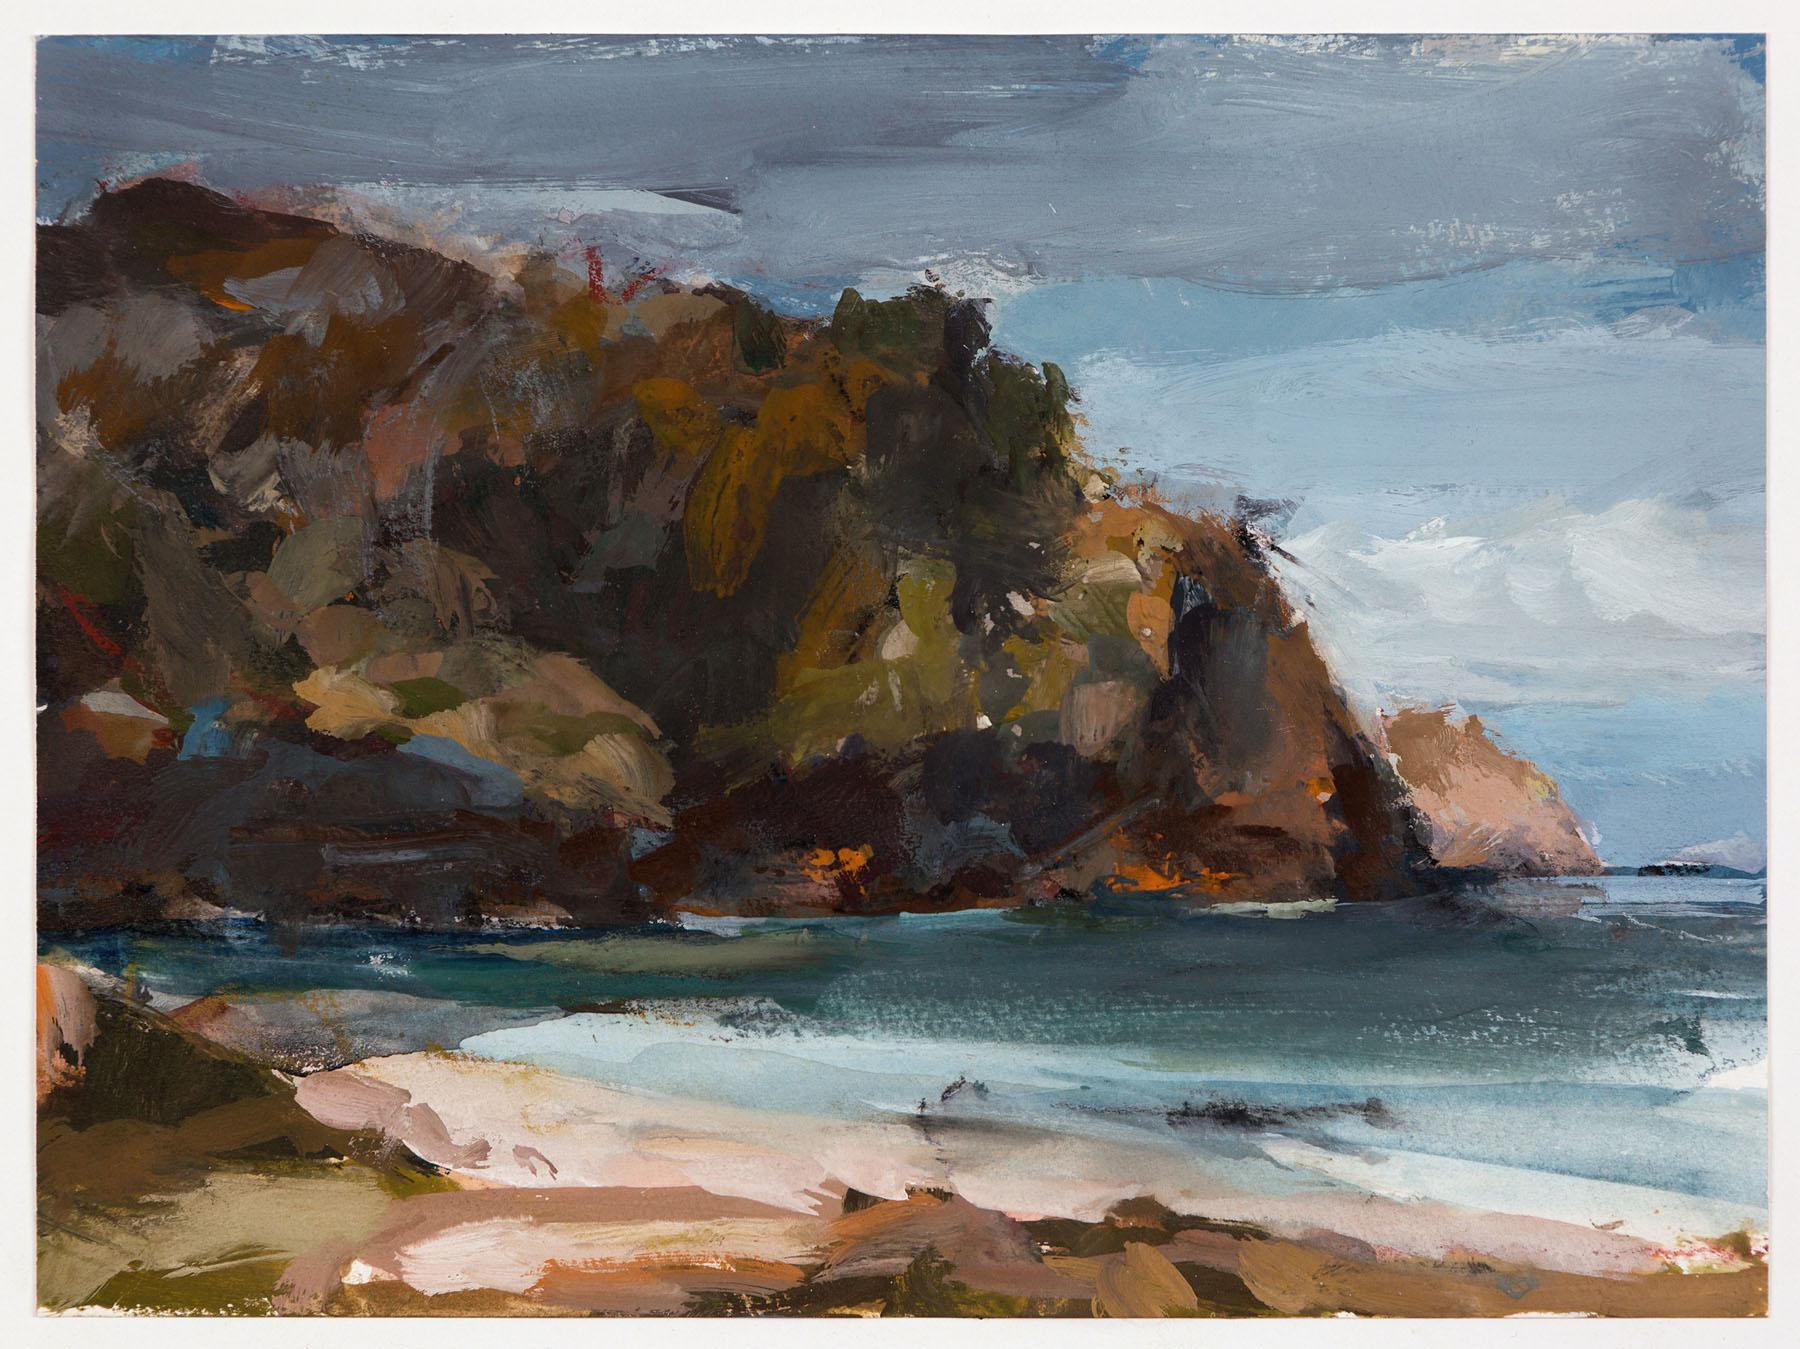 Gabrielle Collins,  Neds Beach . Gouache on paper, 14 x 19cm image, 37 x 41cm framed.